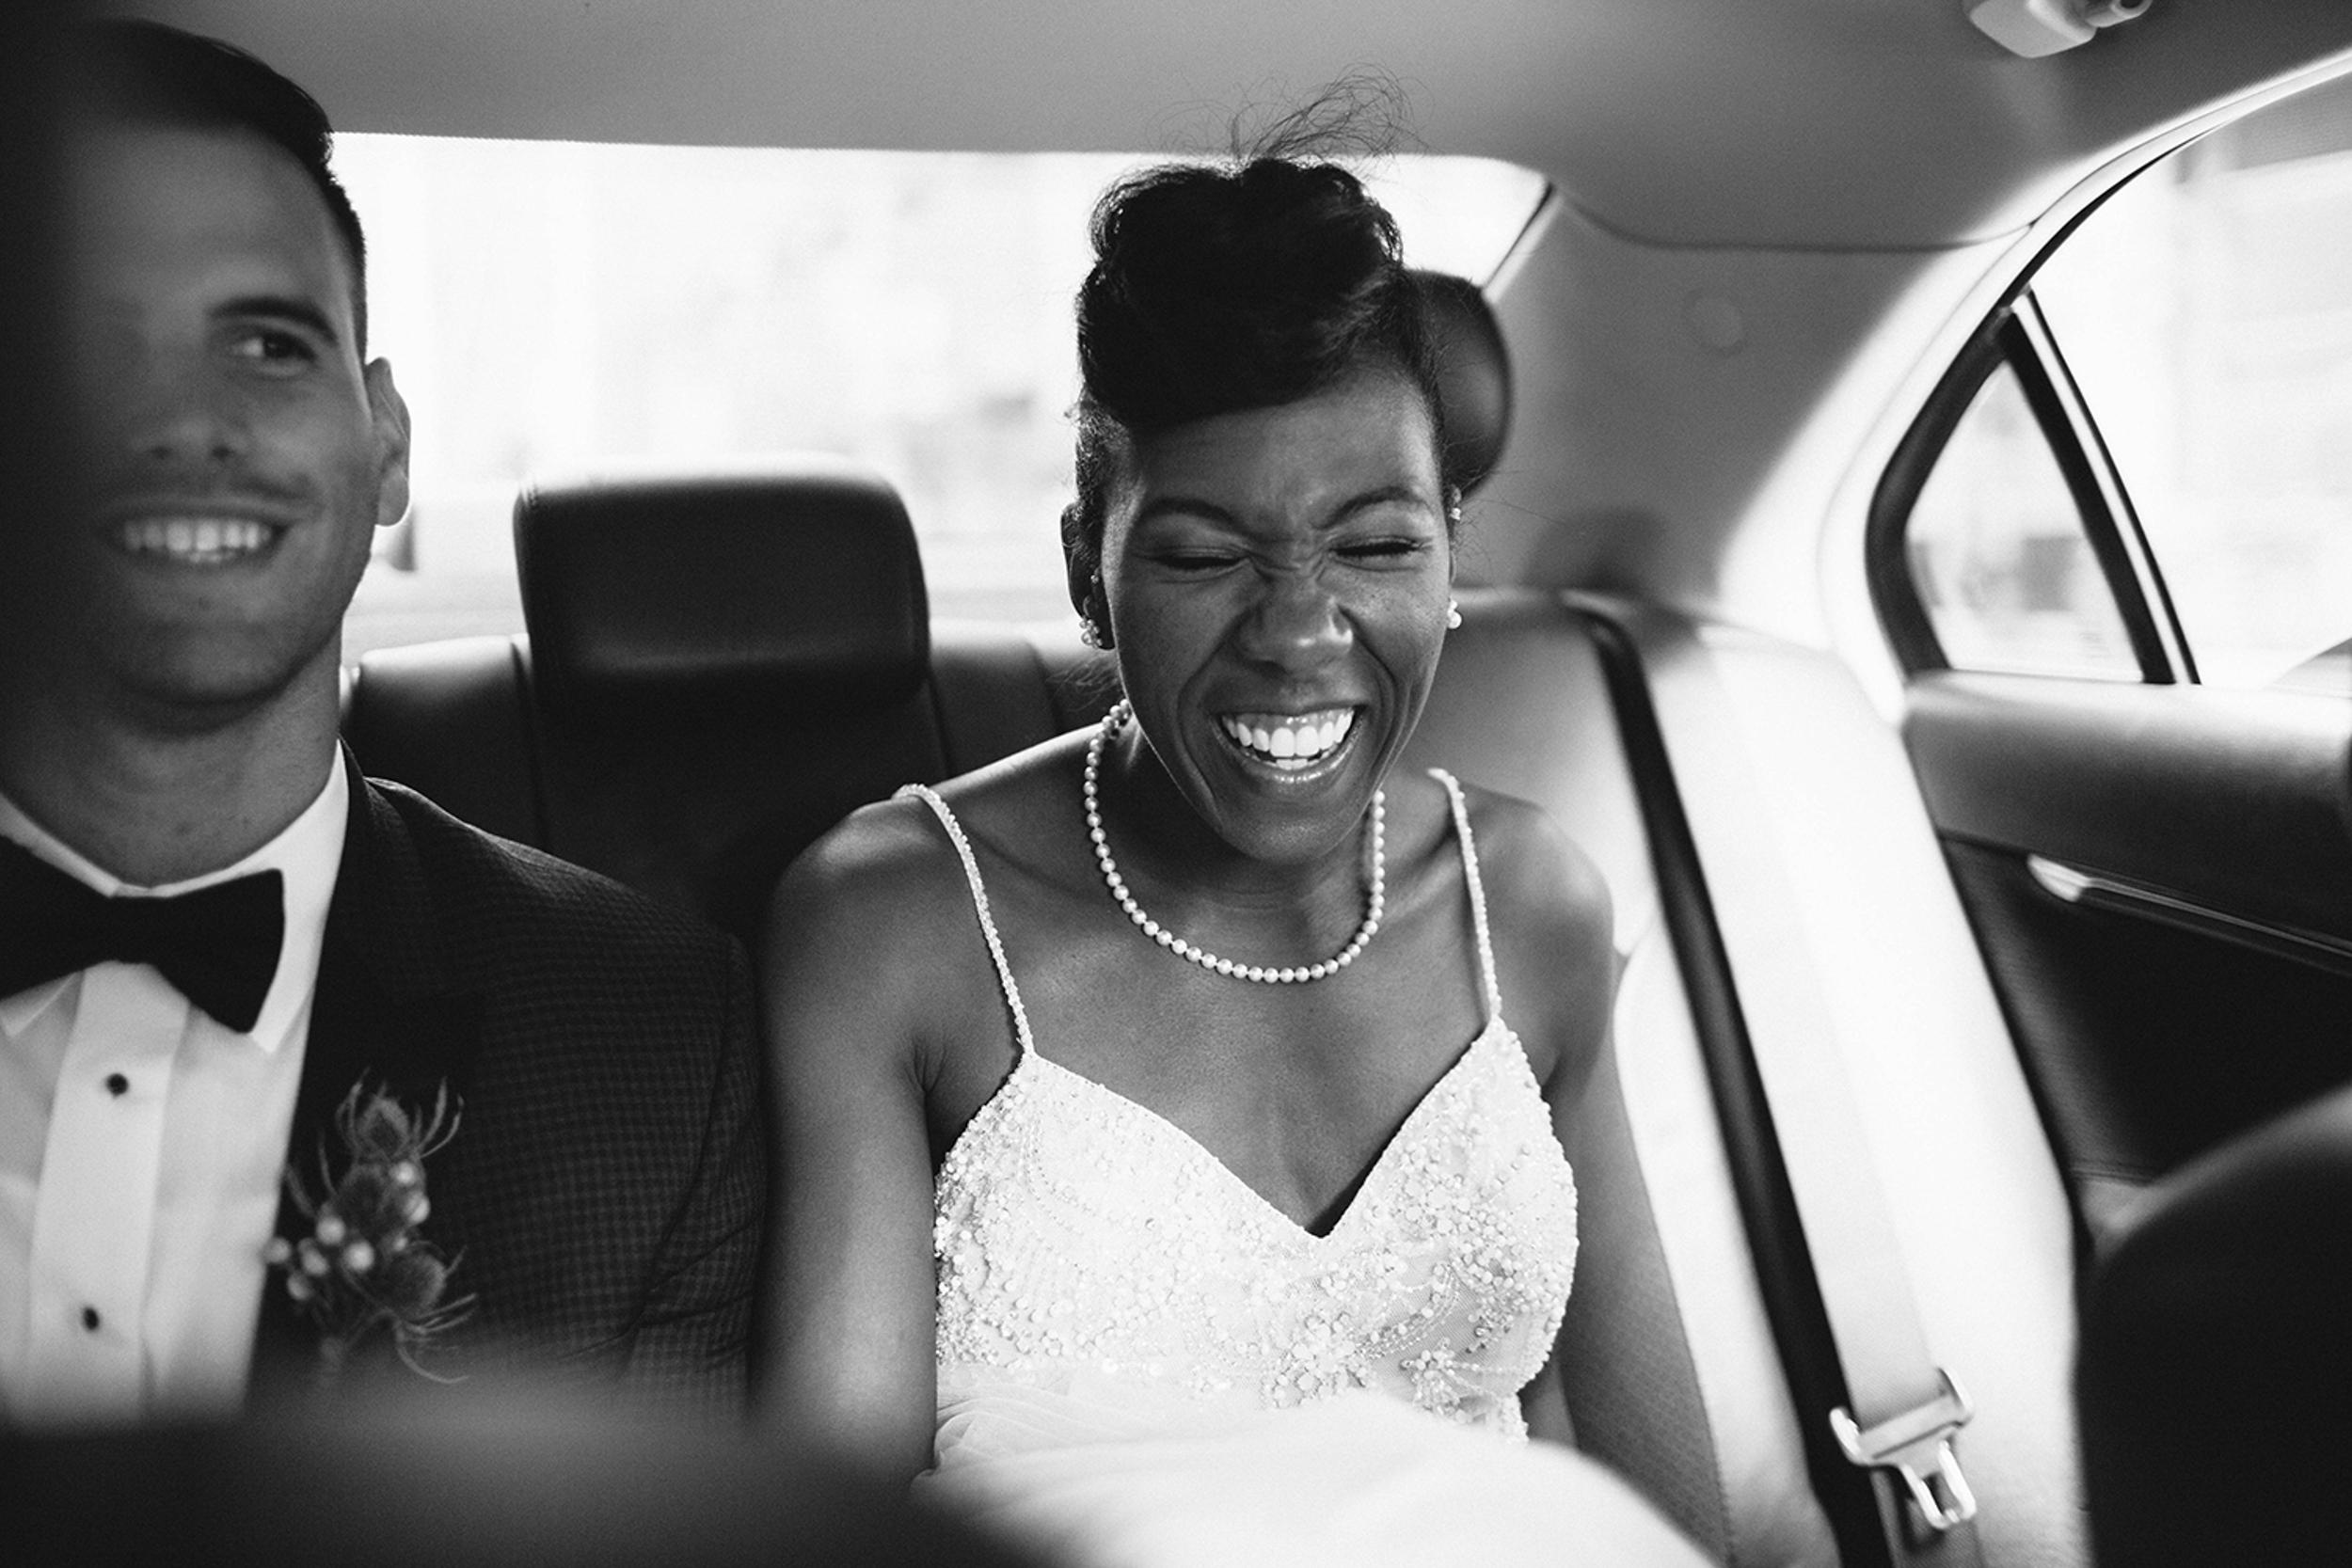 chicago.wedding.urban.intimate.zed451.lake.milton olive park-90.jpg